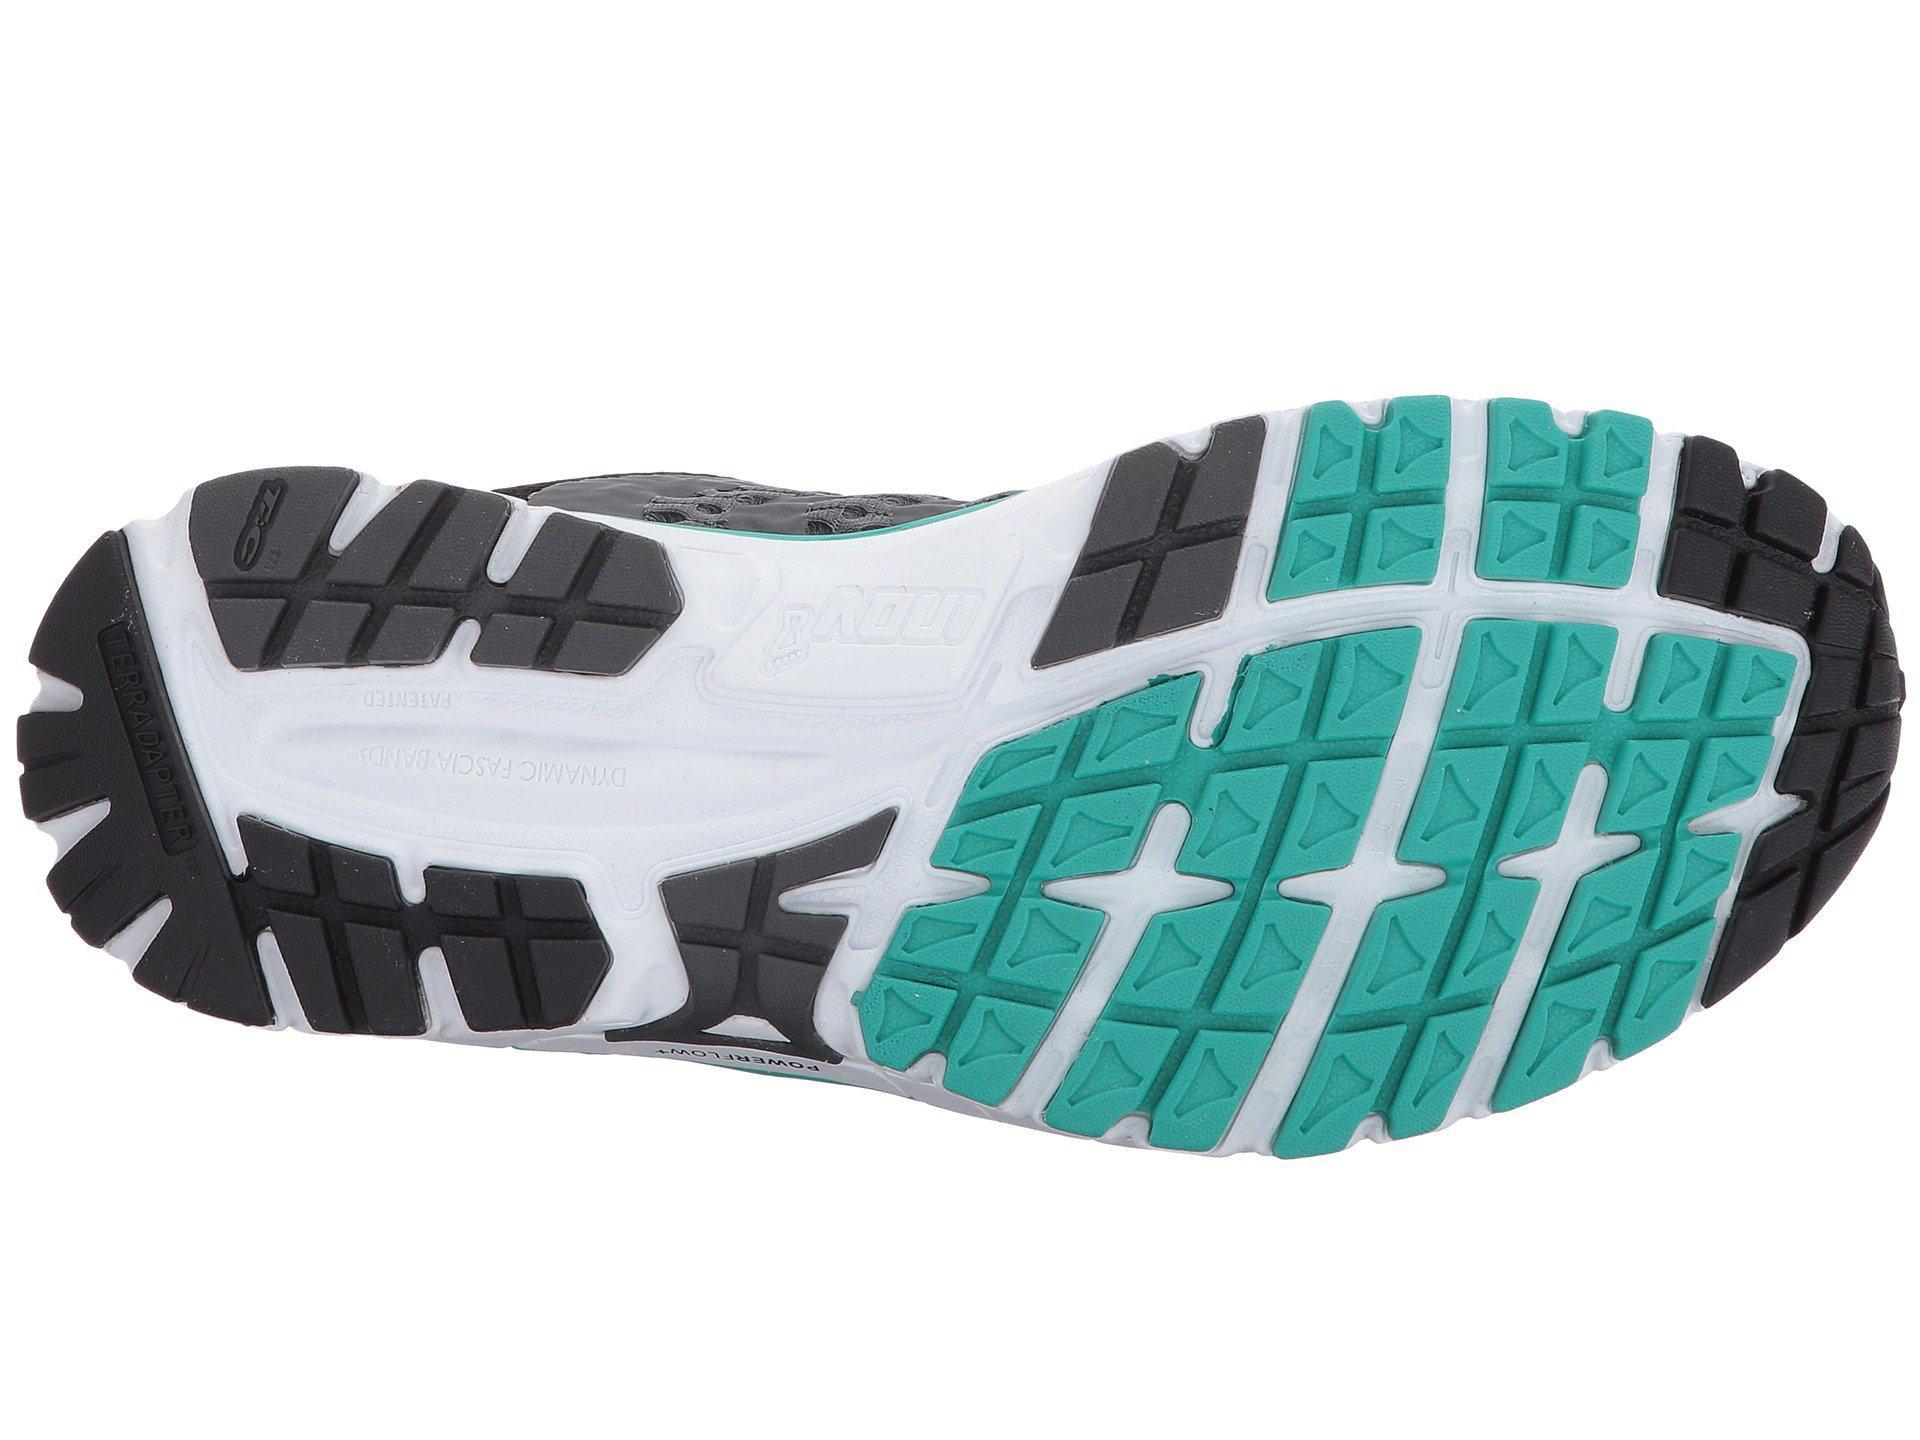 bc75adfafbbff4 Inov-8 - Gray Roadclaw 275 V2 (grey teal) Women s Running Shoes. View  fullscreen